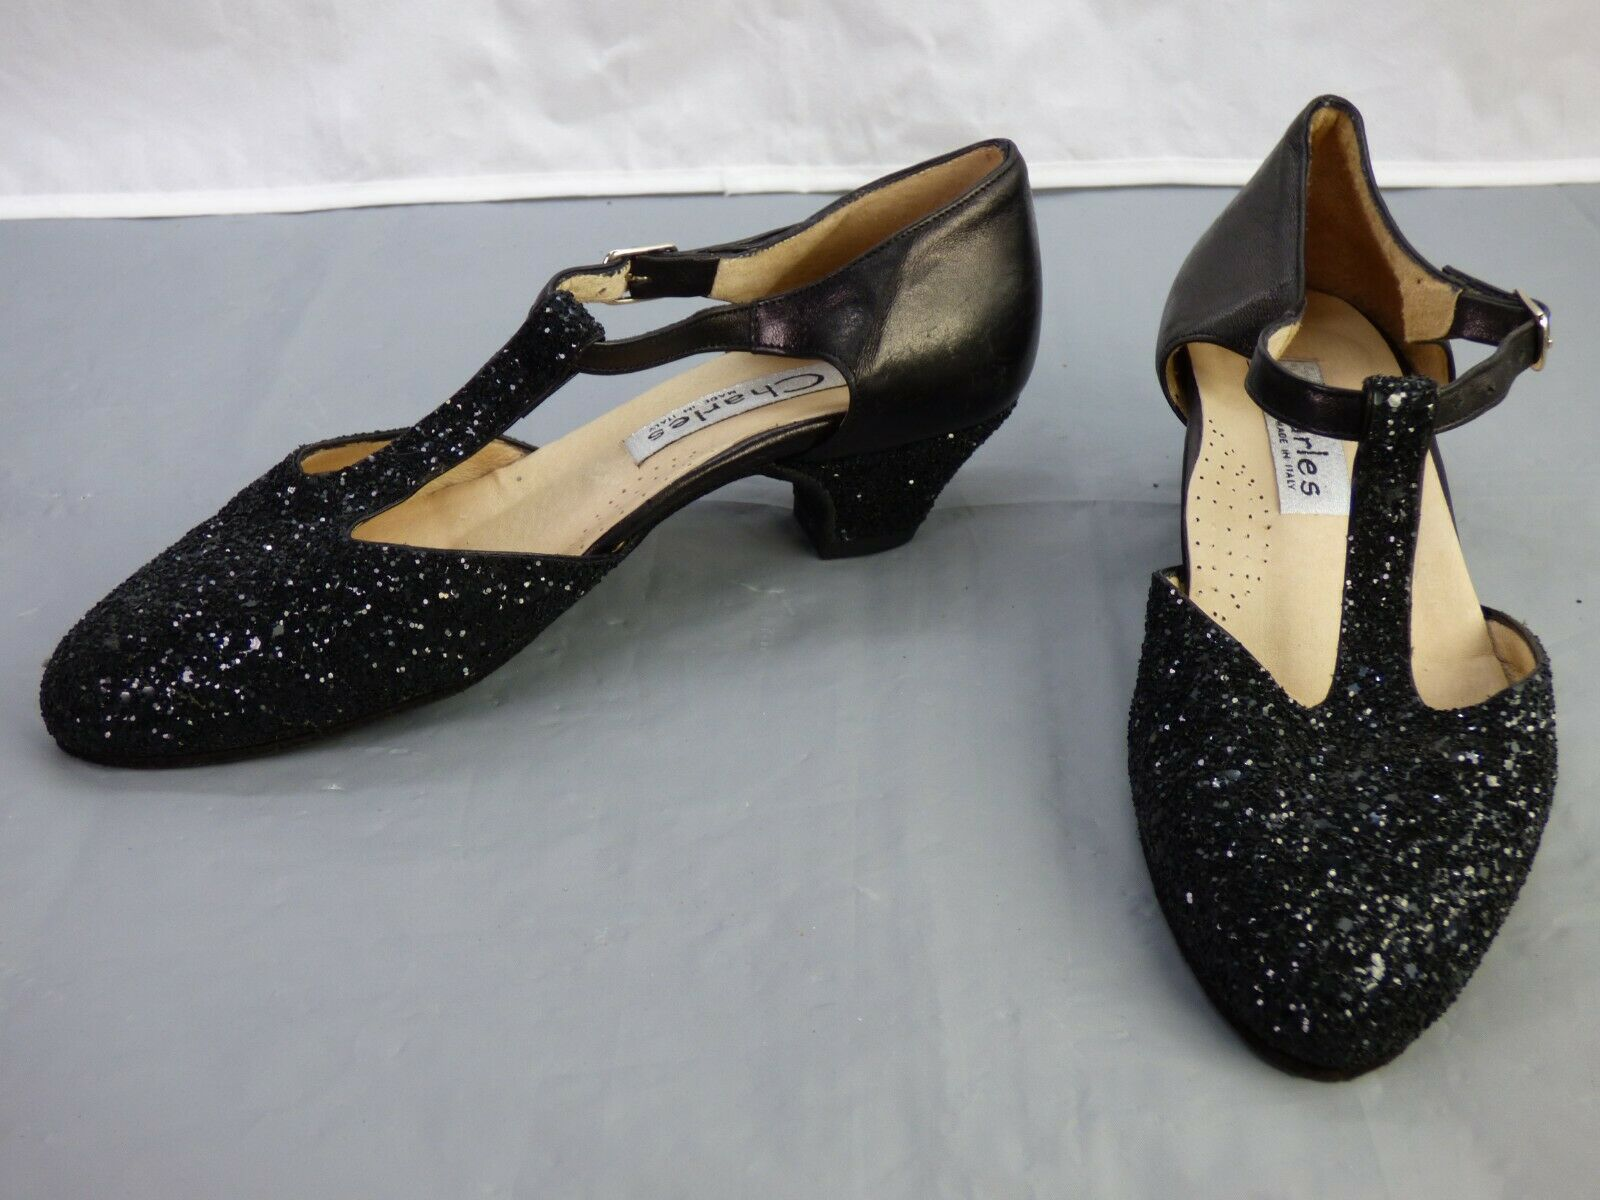 CHARLES Made In Italy Ballroom Dance Black Glitter Tango Salsa Cha Cha Shoes UK3